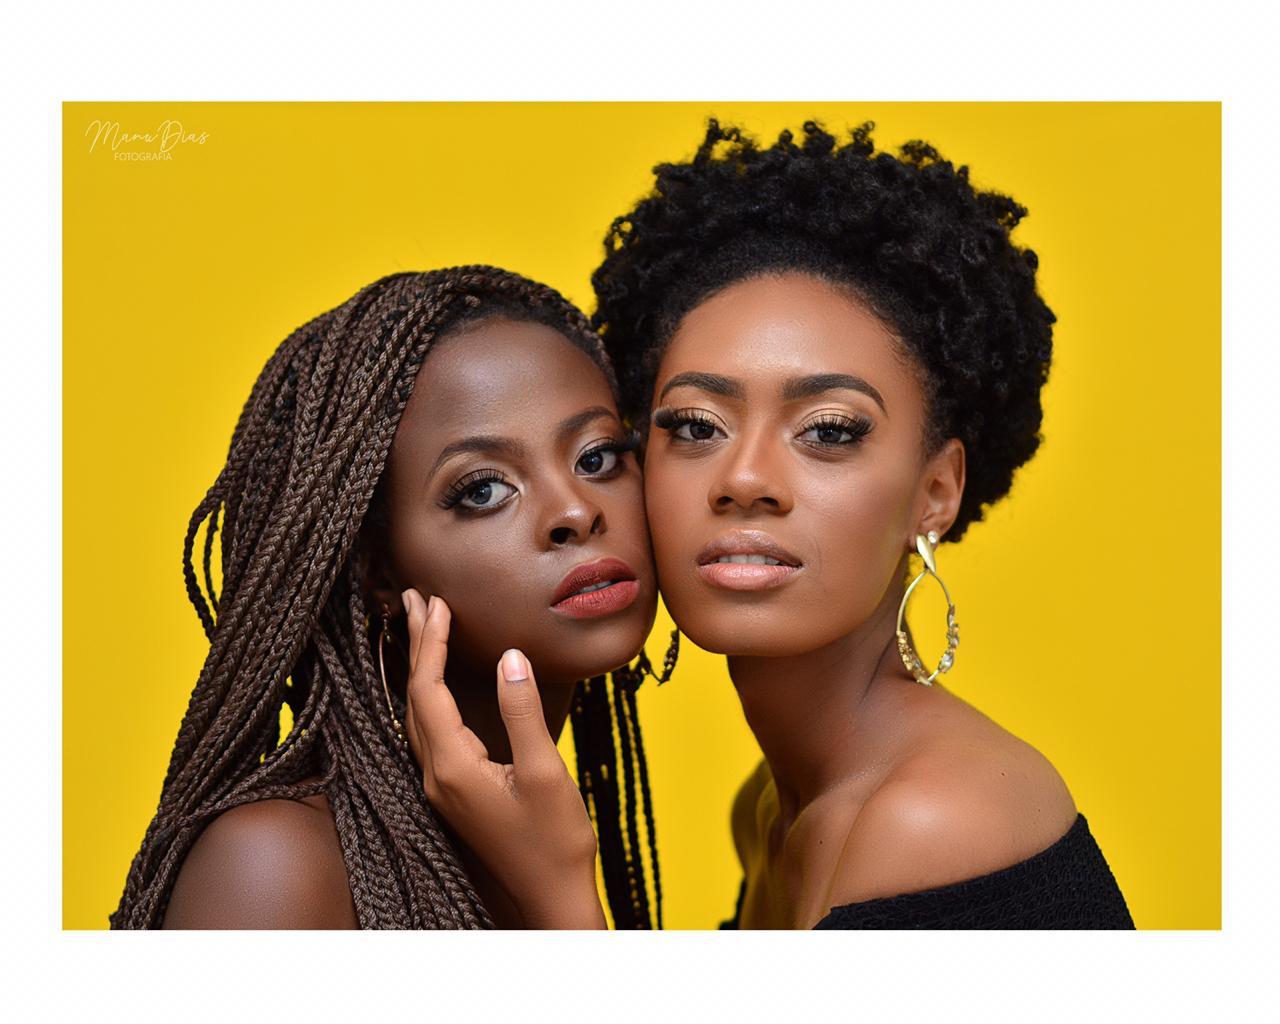 Edital-produzido-em-Irec-valoriza-beleza-da-mulher-negra